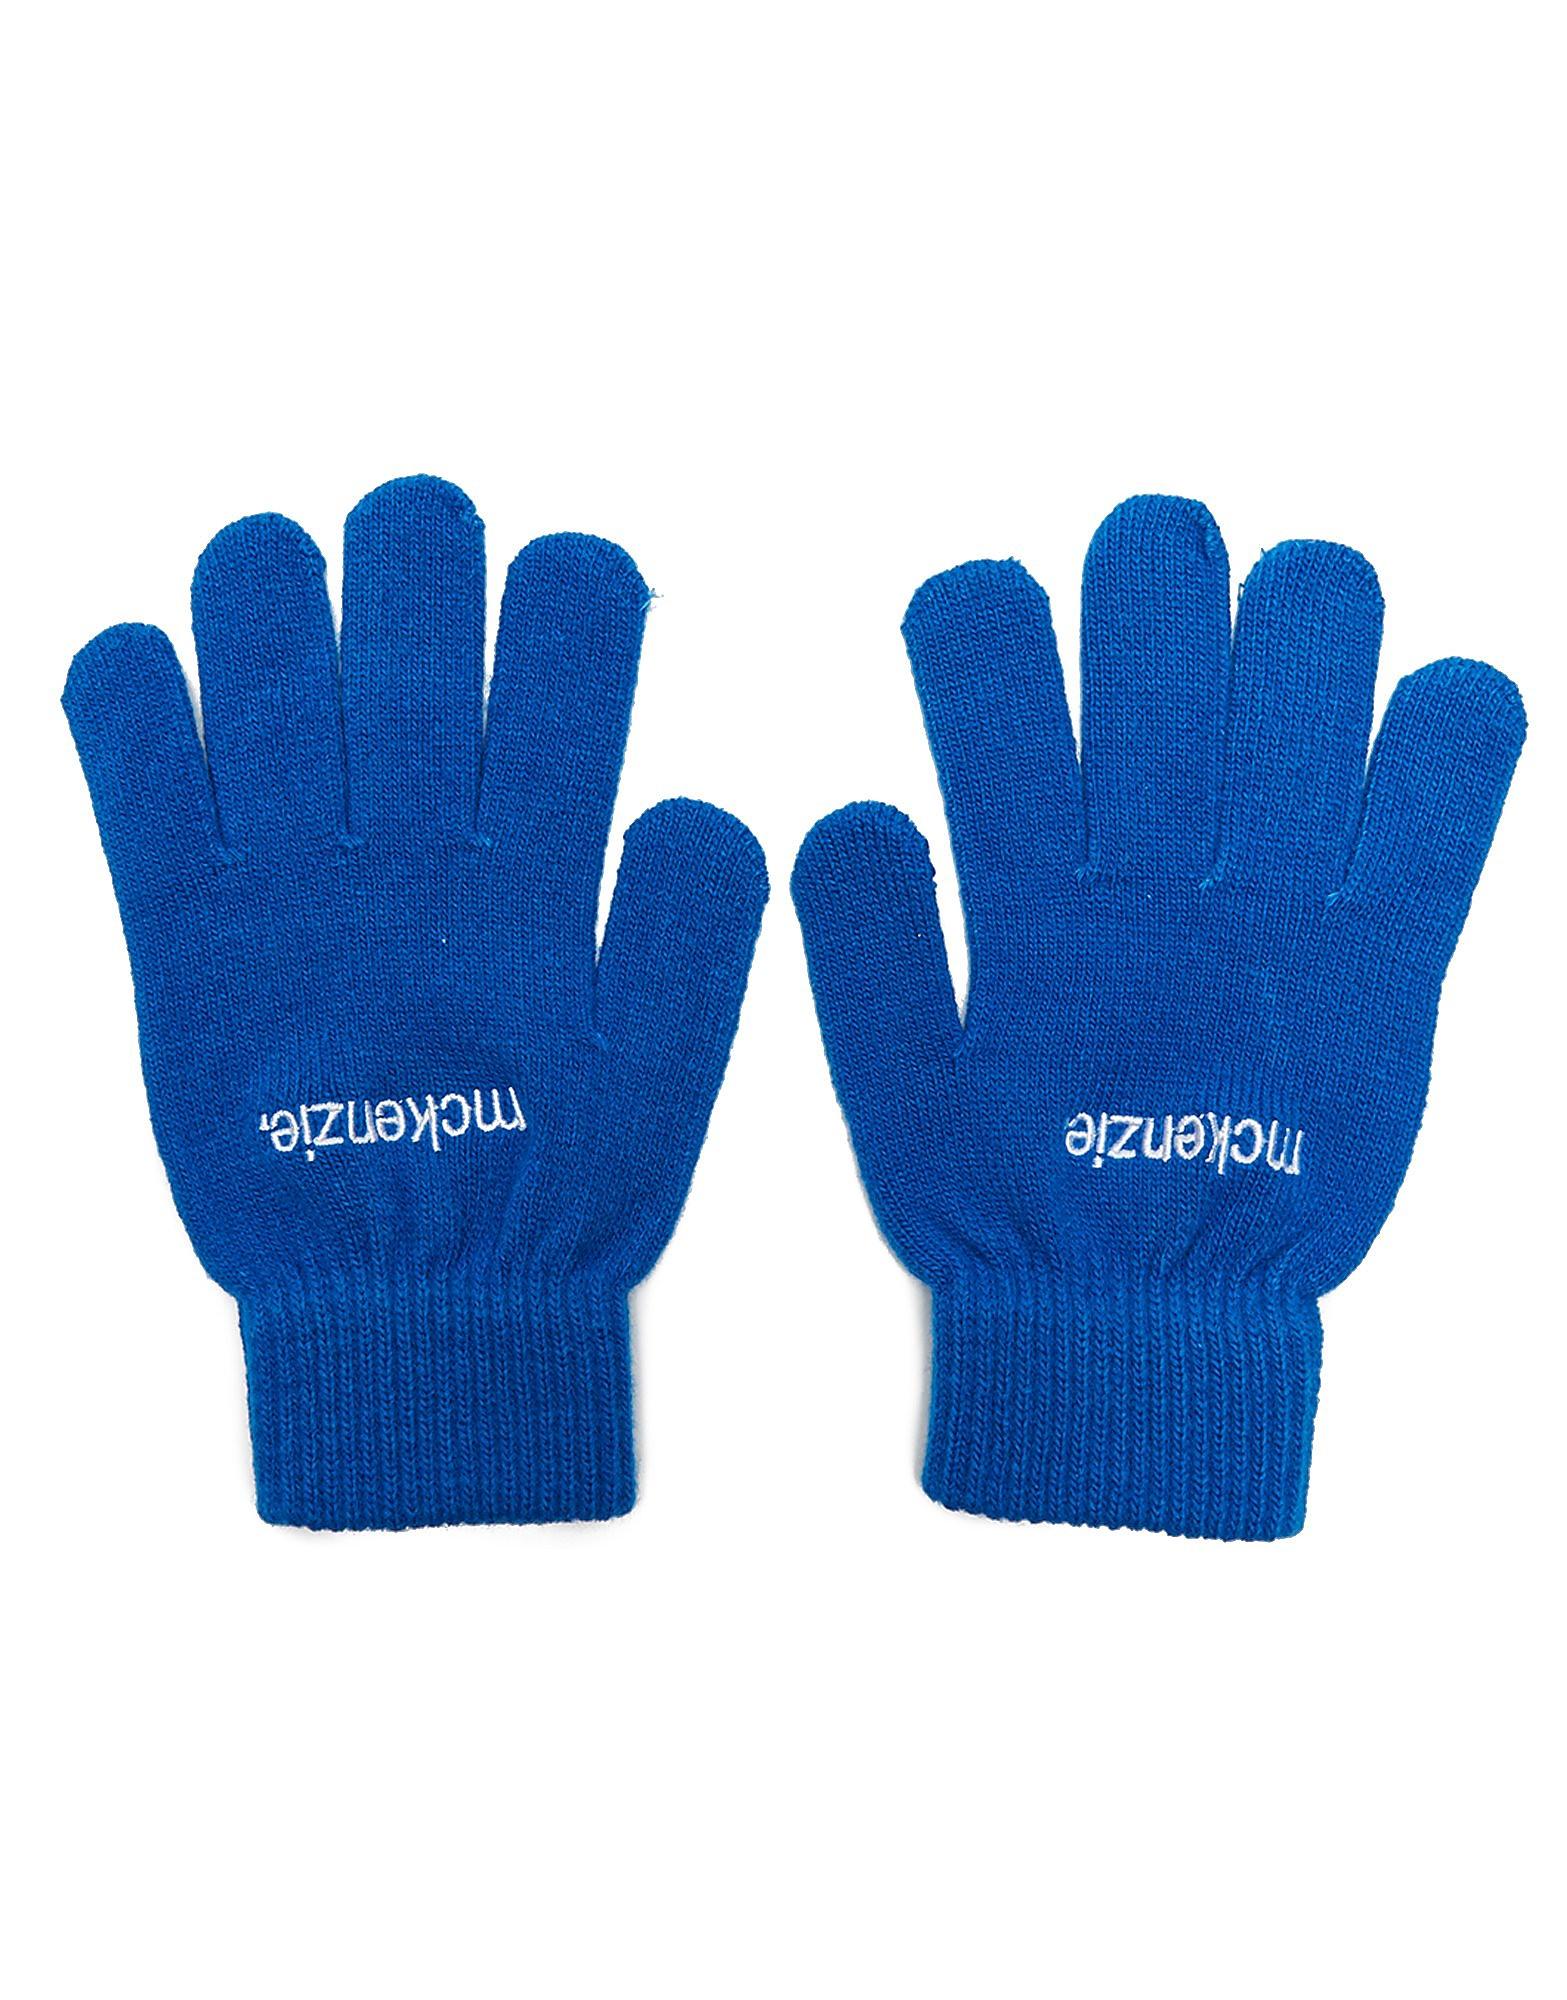 Leather gloves mens jd - Image Of Mens Mckenzie Alonzo Gloves Only At Jd Vibrant Blue Vibrant Blue